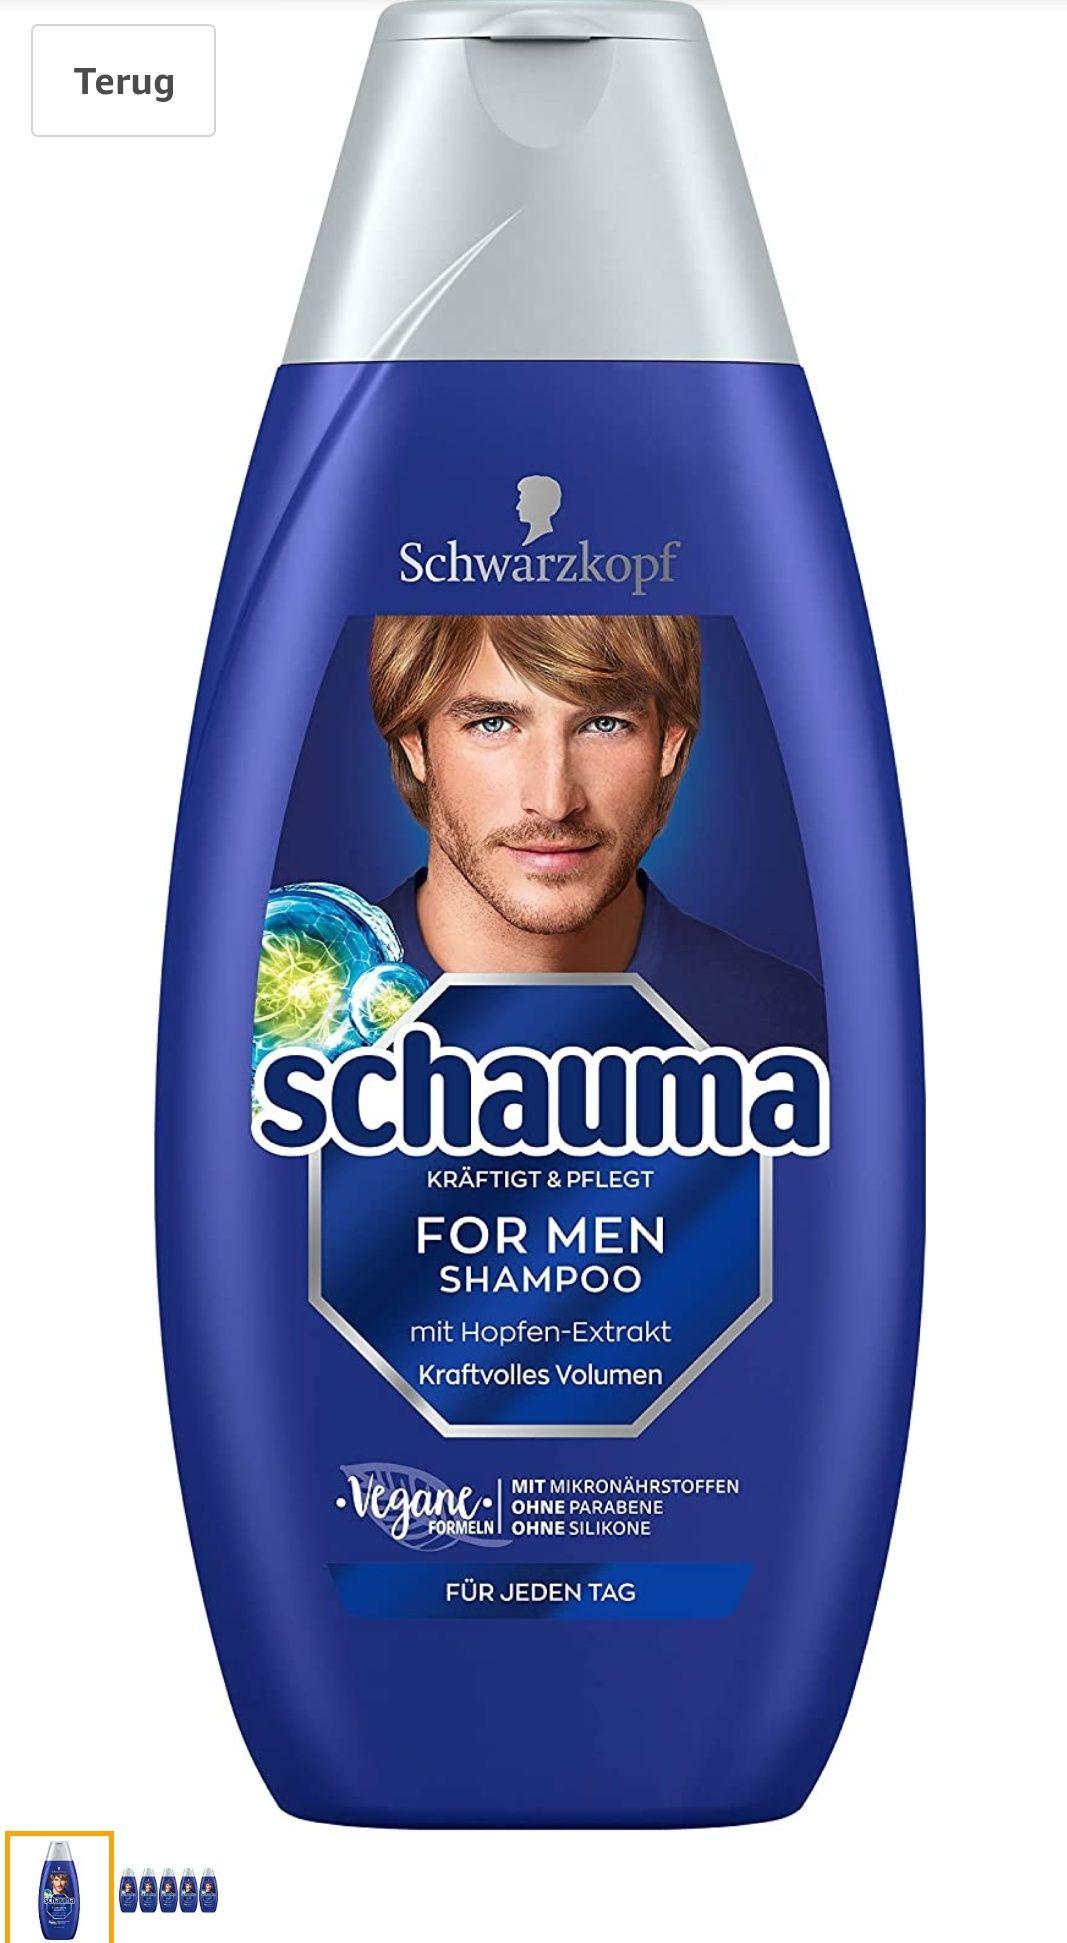 Schwarzkopf For Men Shampoo 5x 400 ml